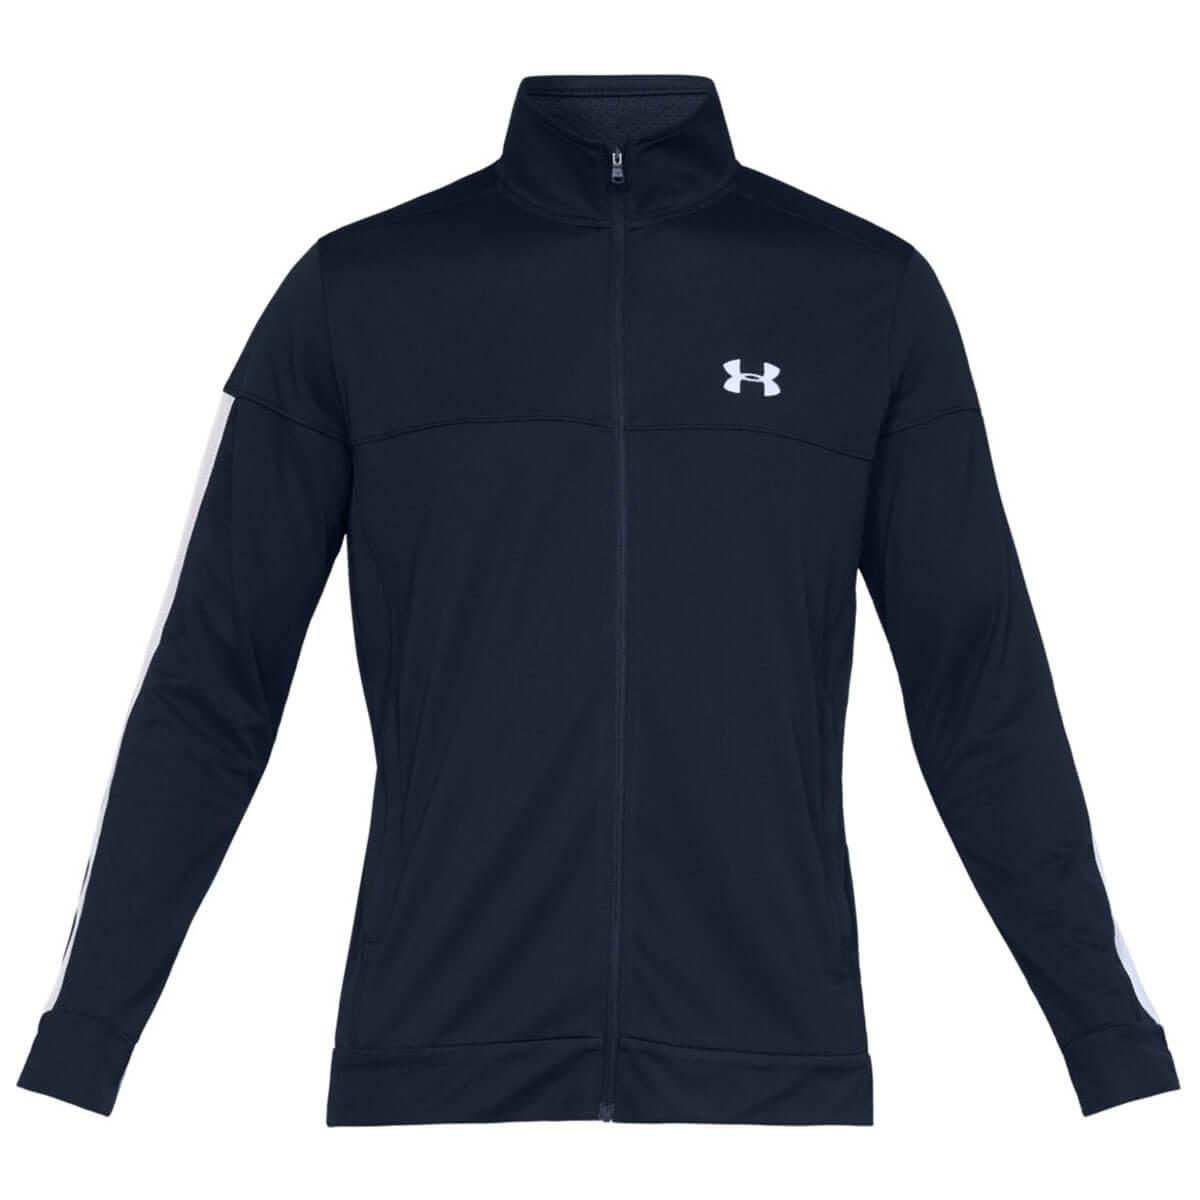 Under-Armour-Mens-2019-Sportstyle-Pique-Stretch-Quick-Dry-Wicking-Fleece-Jacket miniatura 4